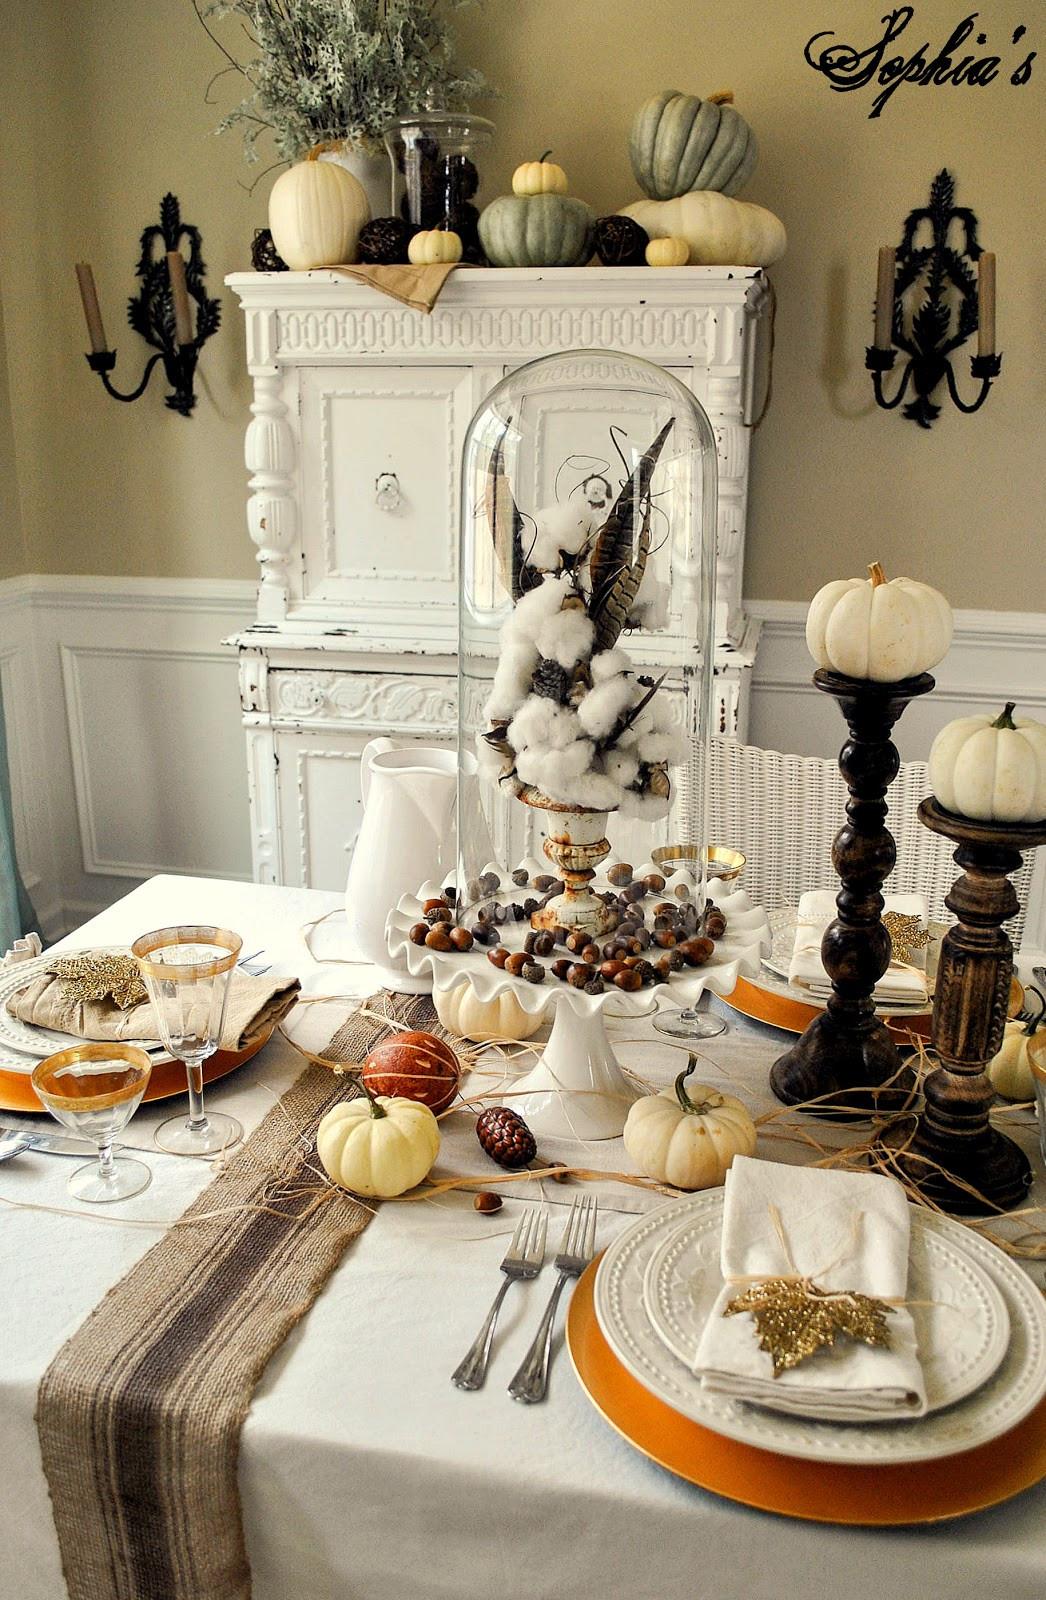 Thanksgiving Table Decorations  Sophia s Thanksgiving Table Setting